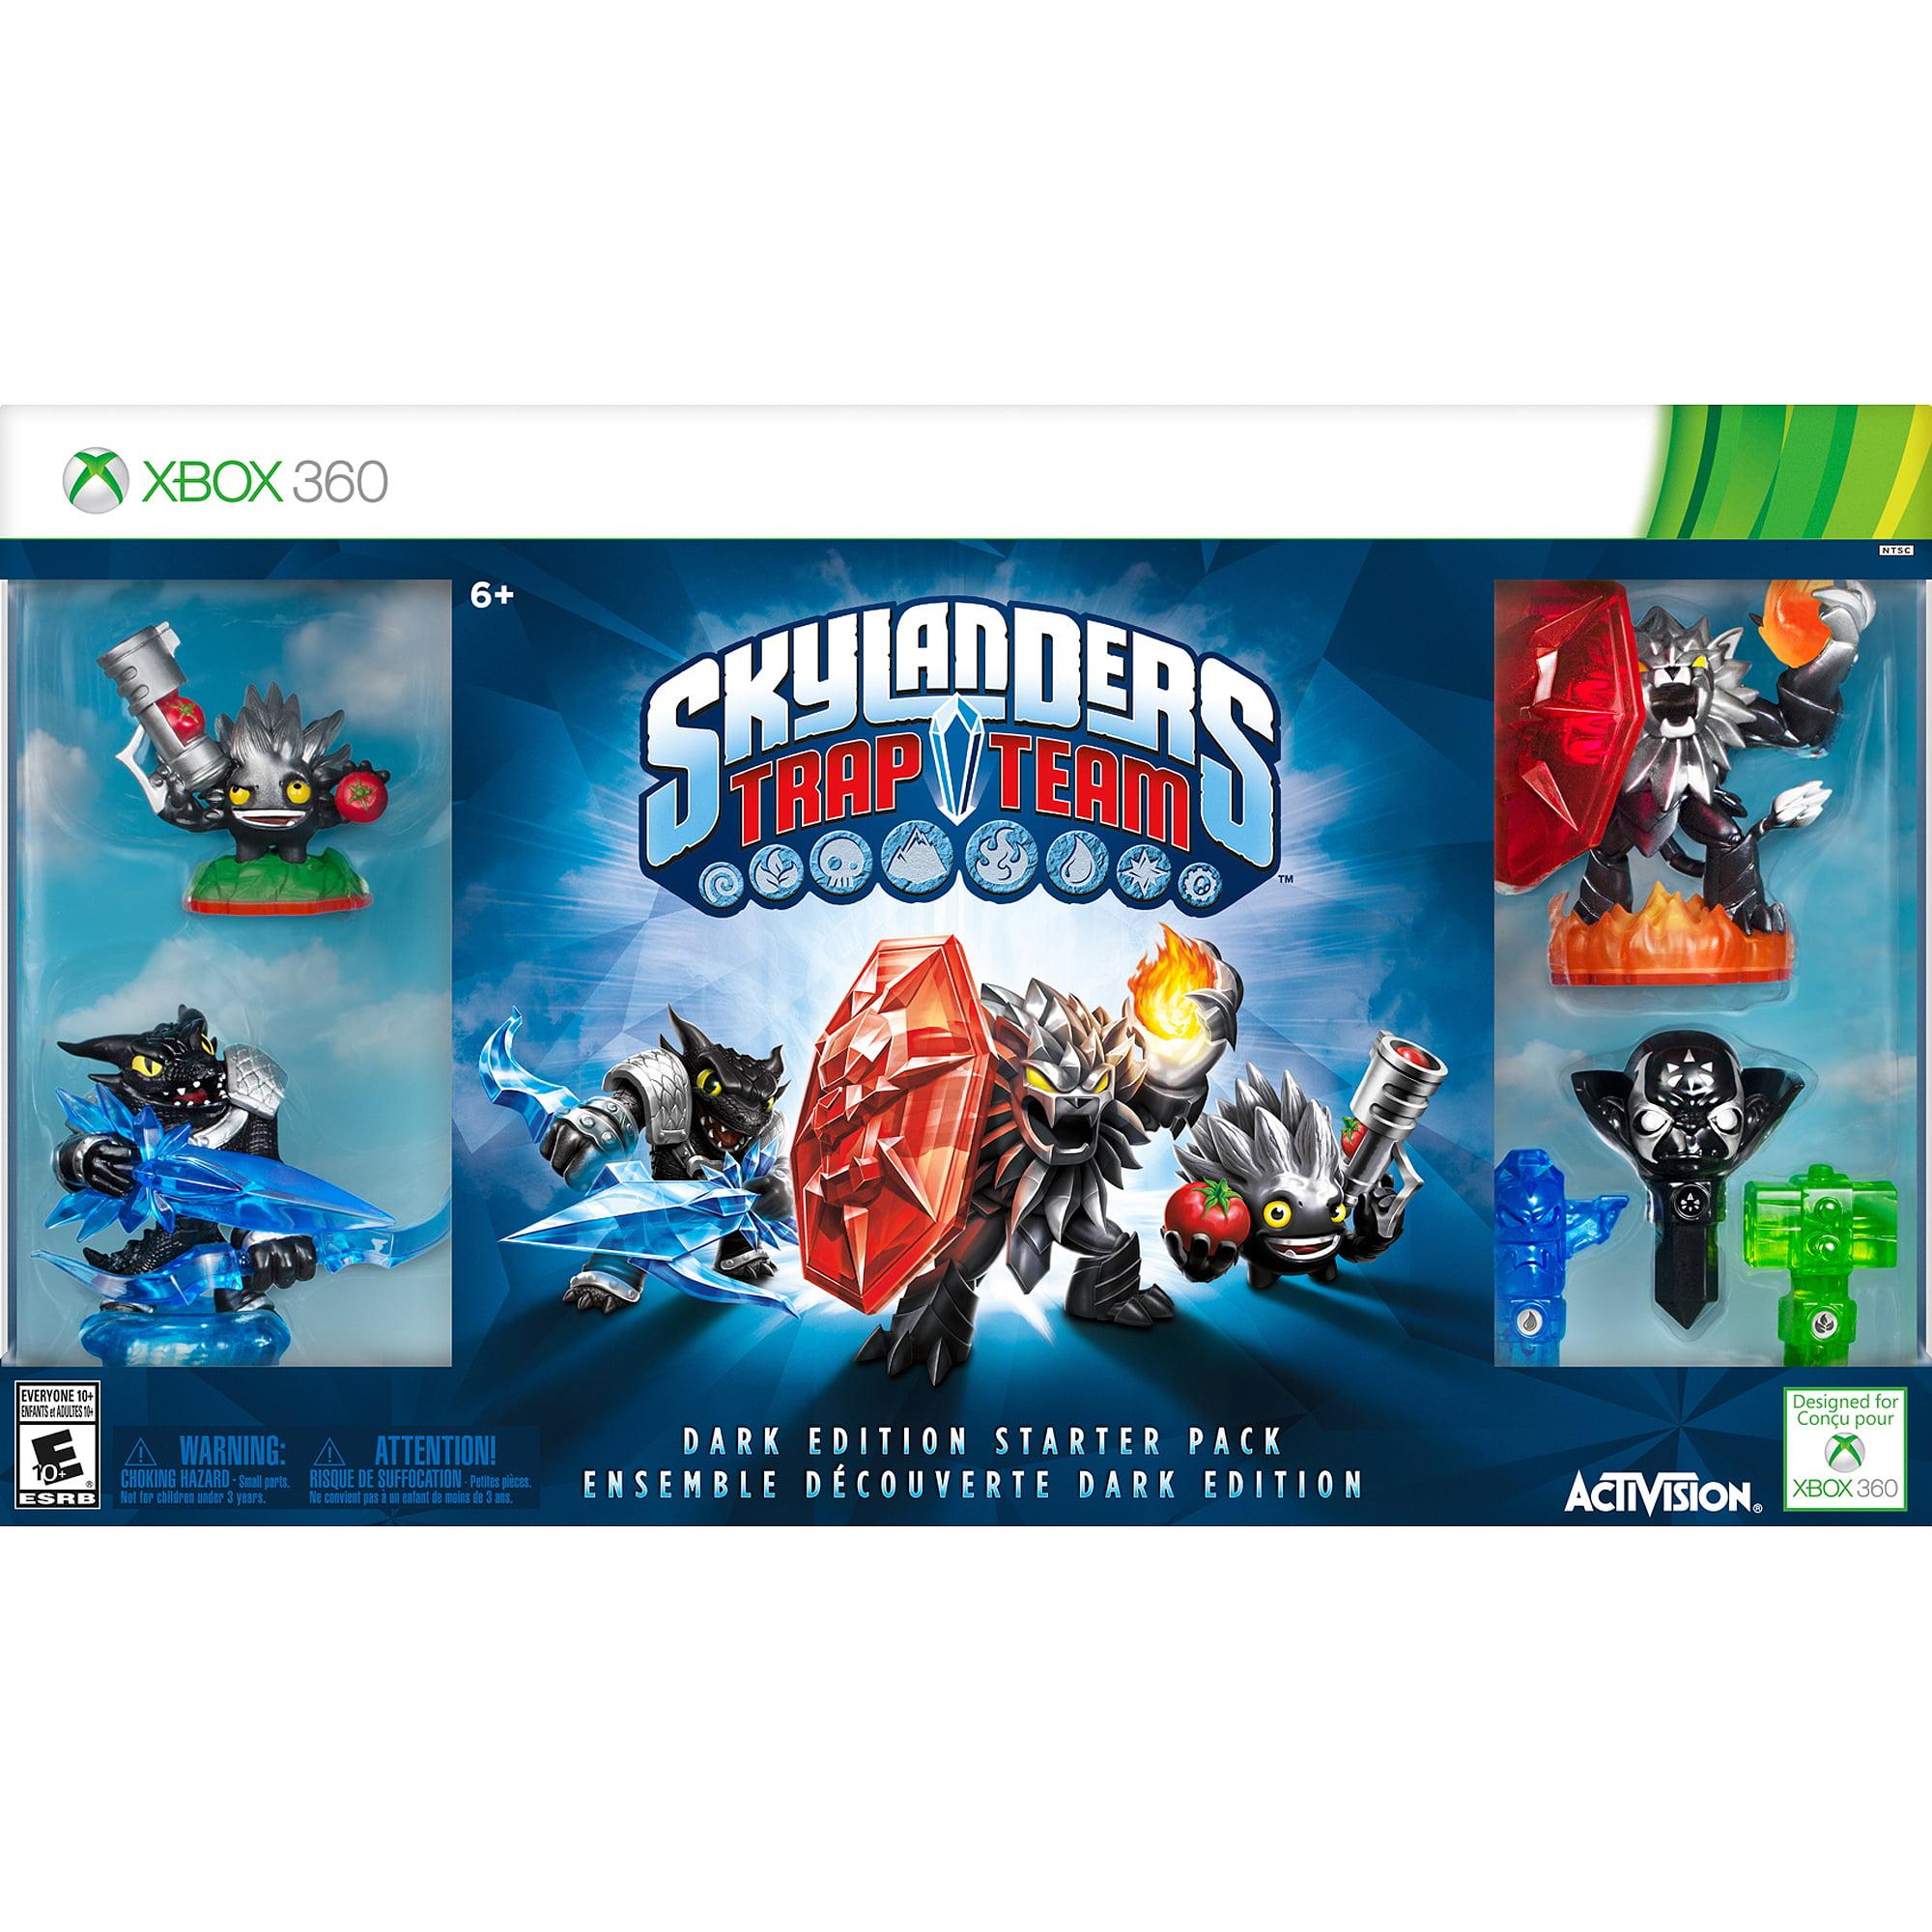 Skylanders Trap Team Dark Edition Starter Pack - Xbox 360